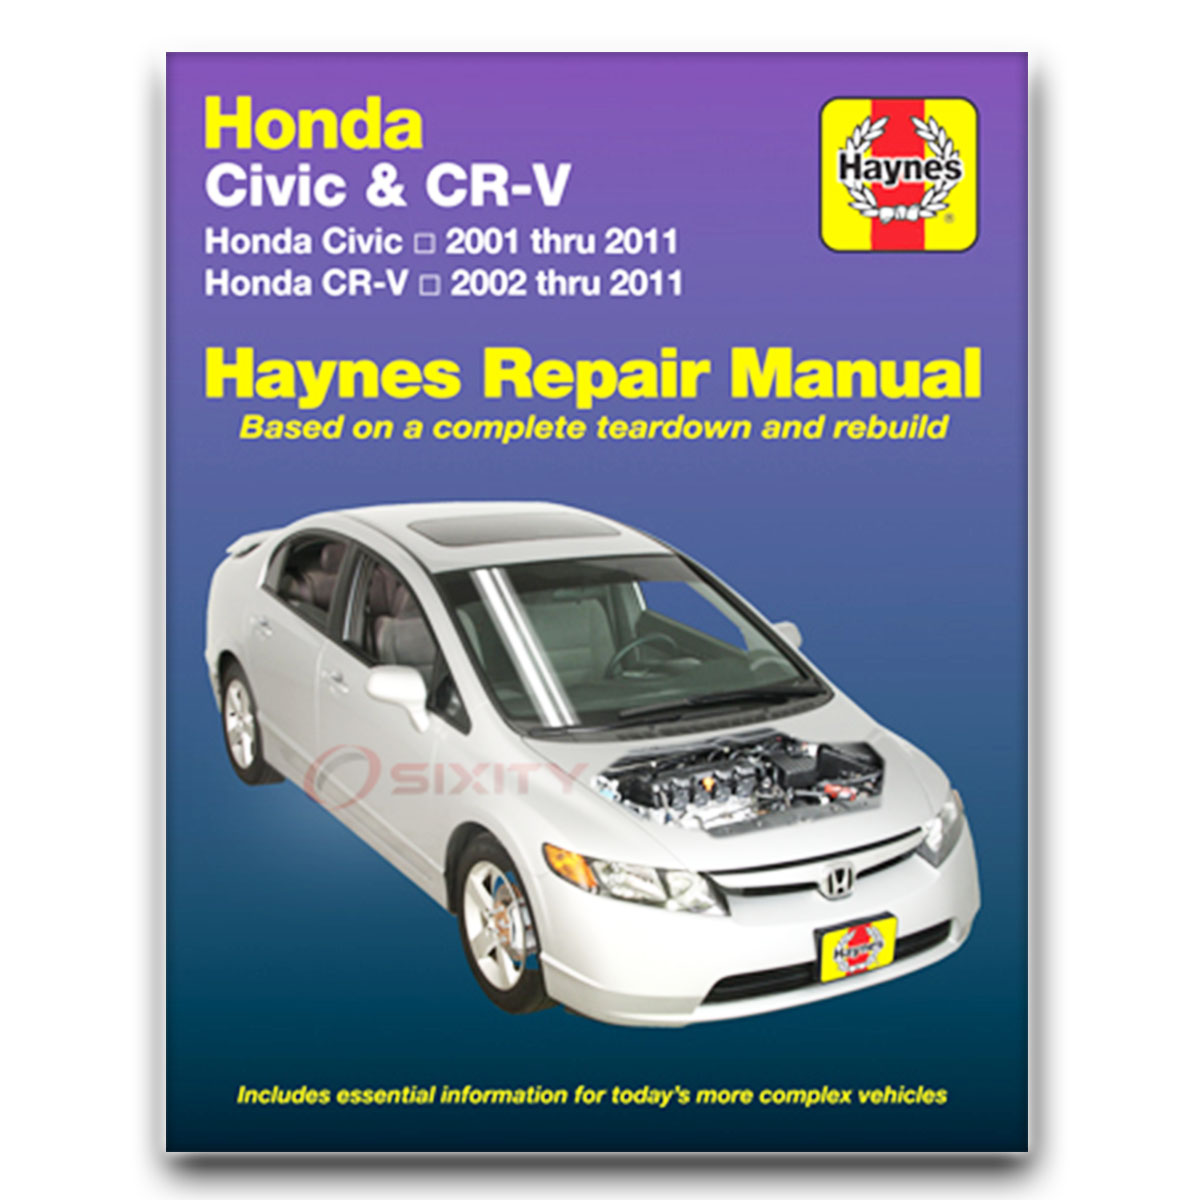 Haynes Repair Manual 42026 for Honda Civic 01-10 and CR-V 02-09 Shop Service  vt